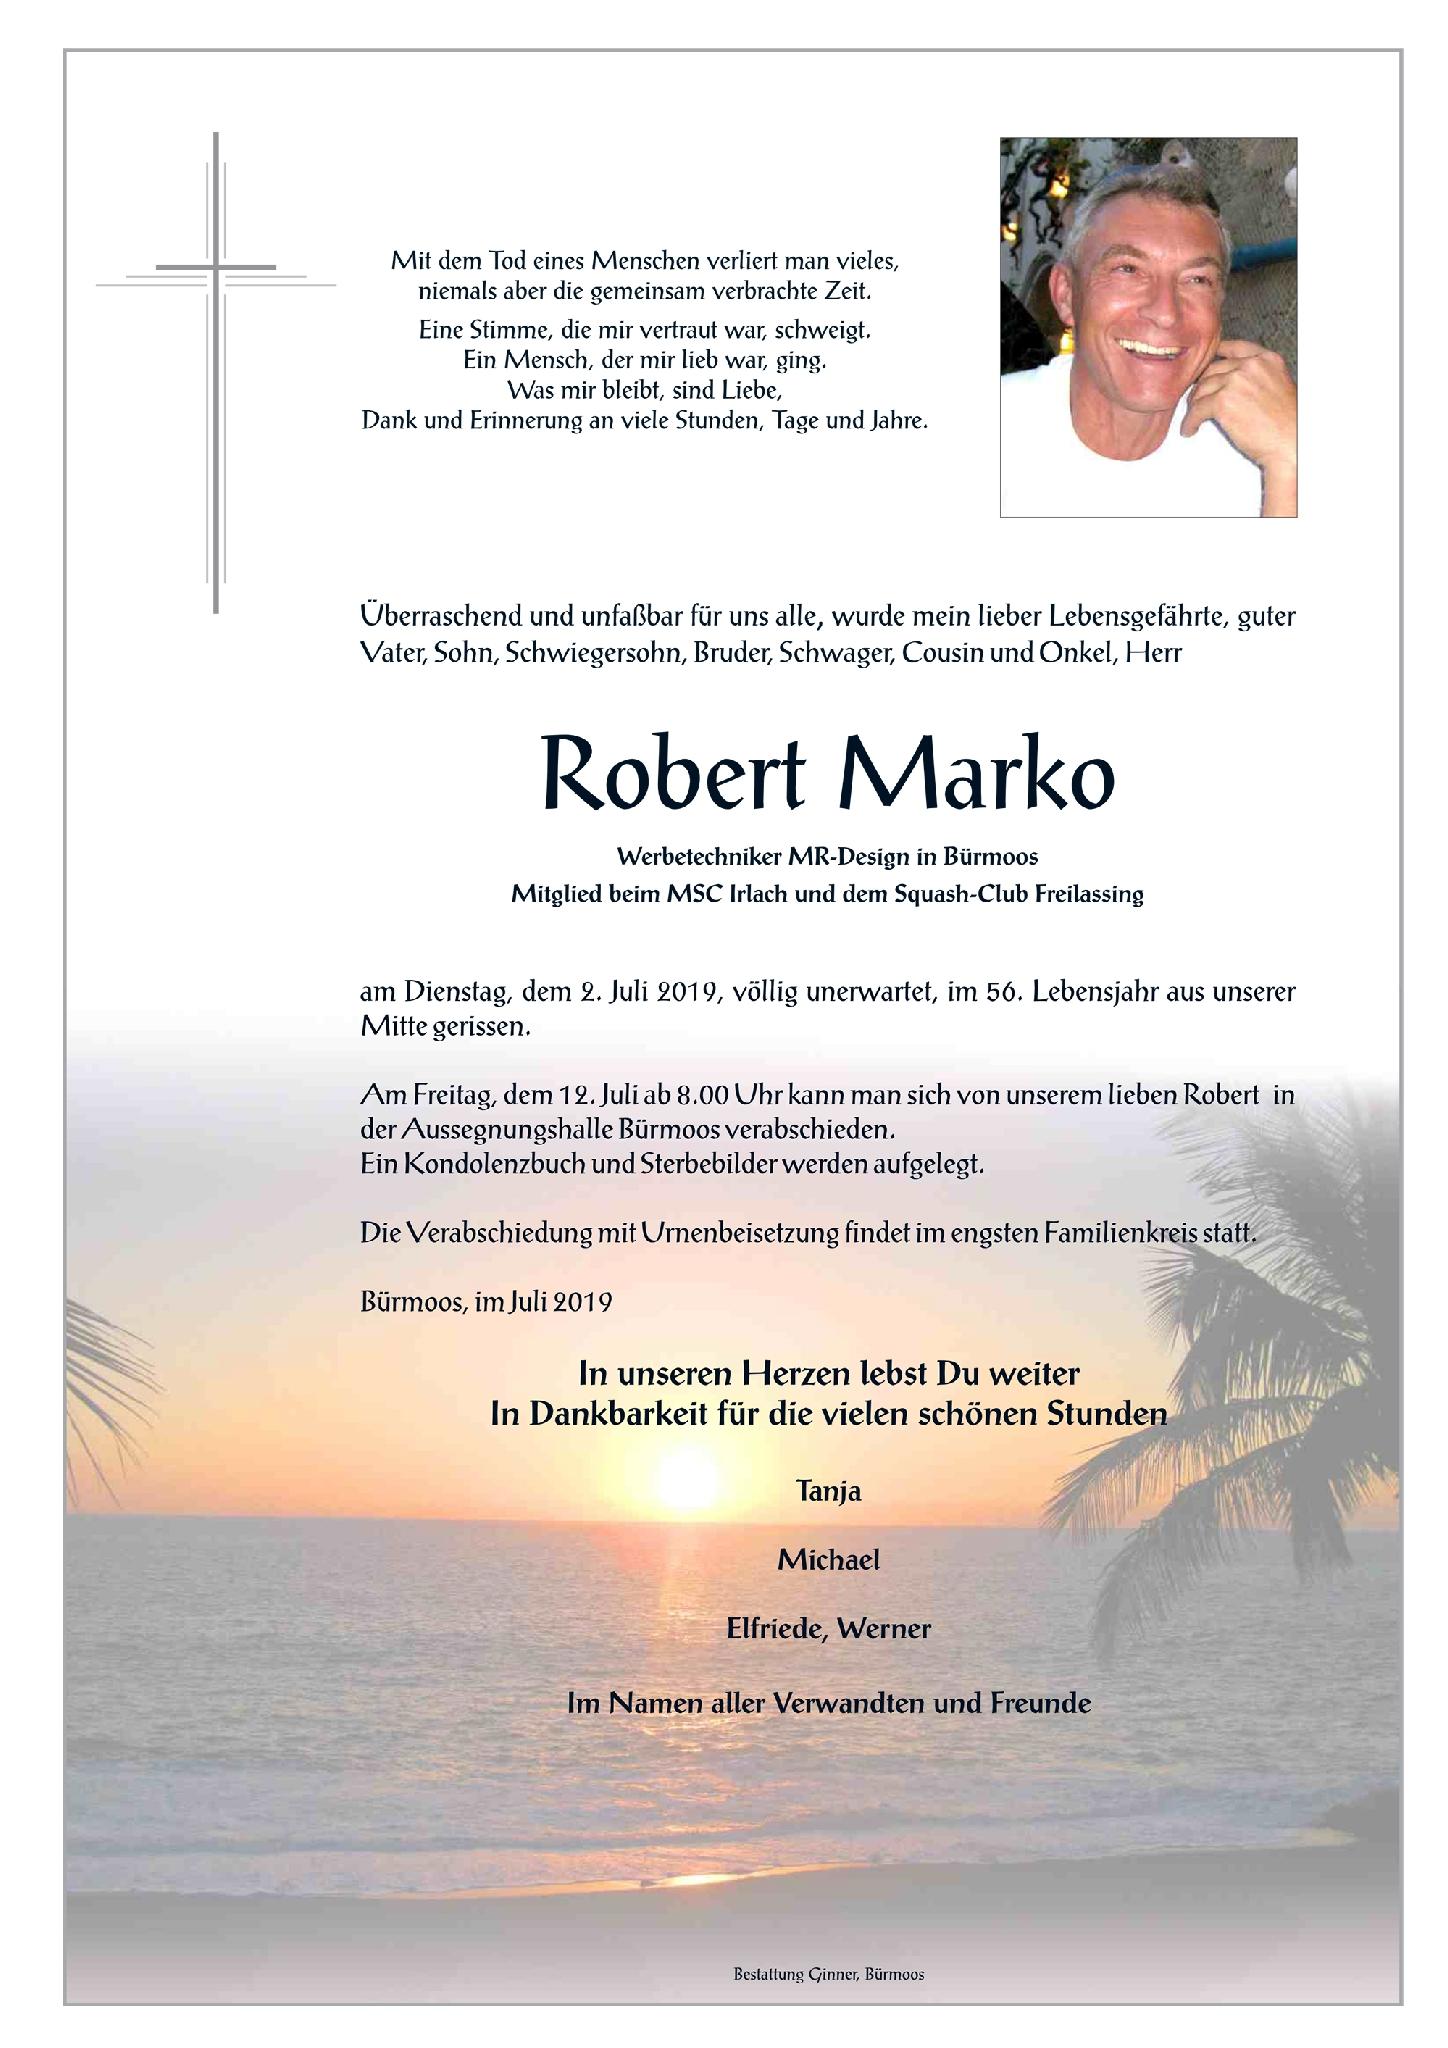 20190708_Parte_Robert_Marko